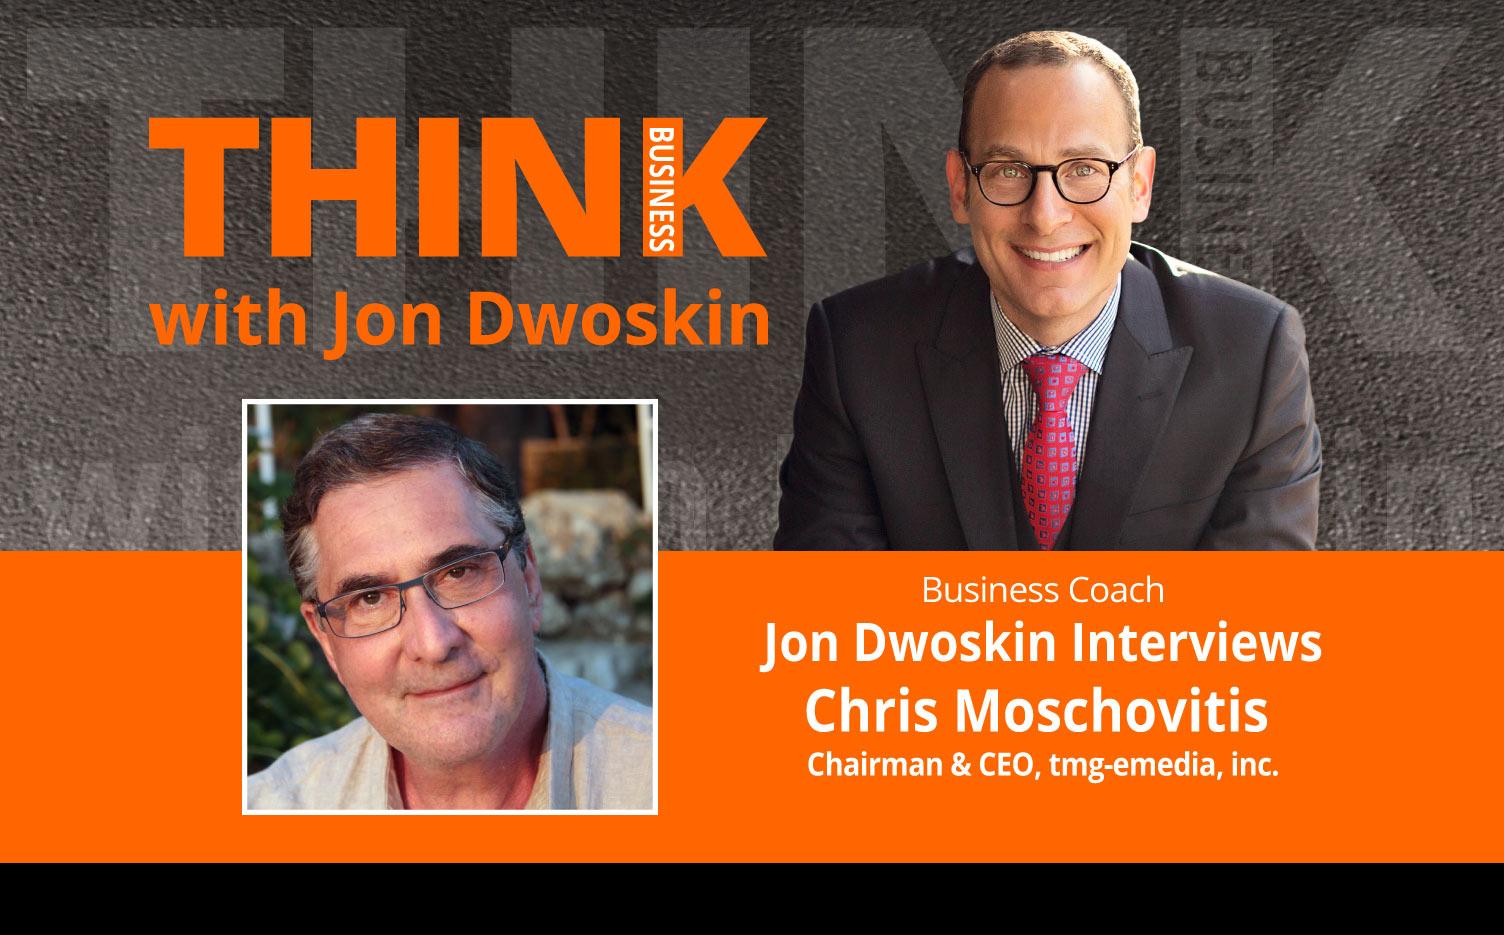 THINK Business Podcast: Jon Dwoskin Interviews Chris Moschovitis, Chairman & CEO, tmg-emedia, inc.